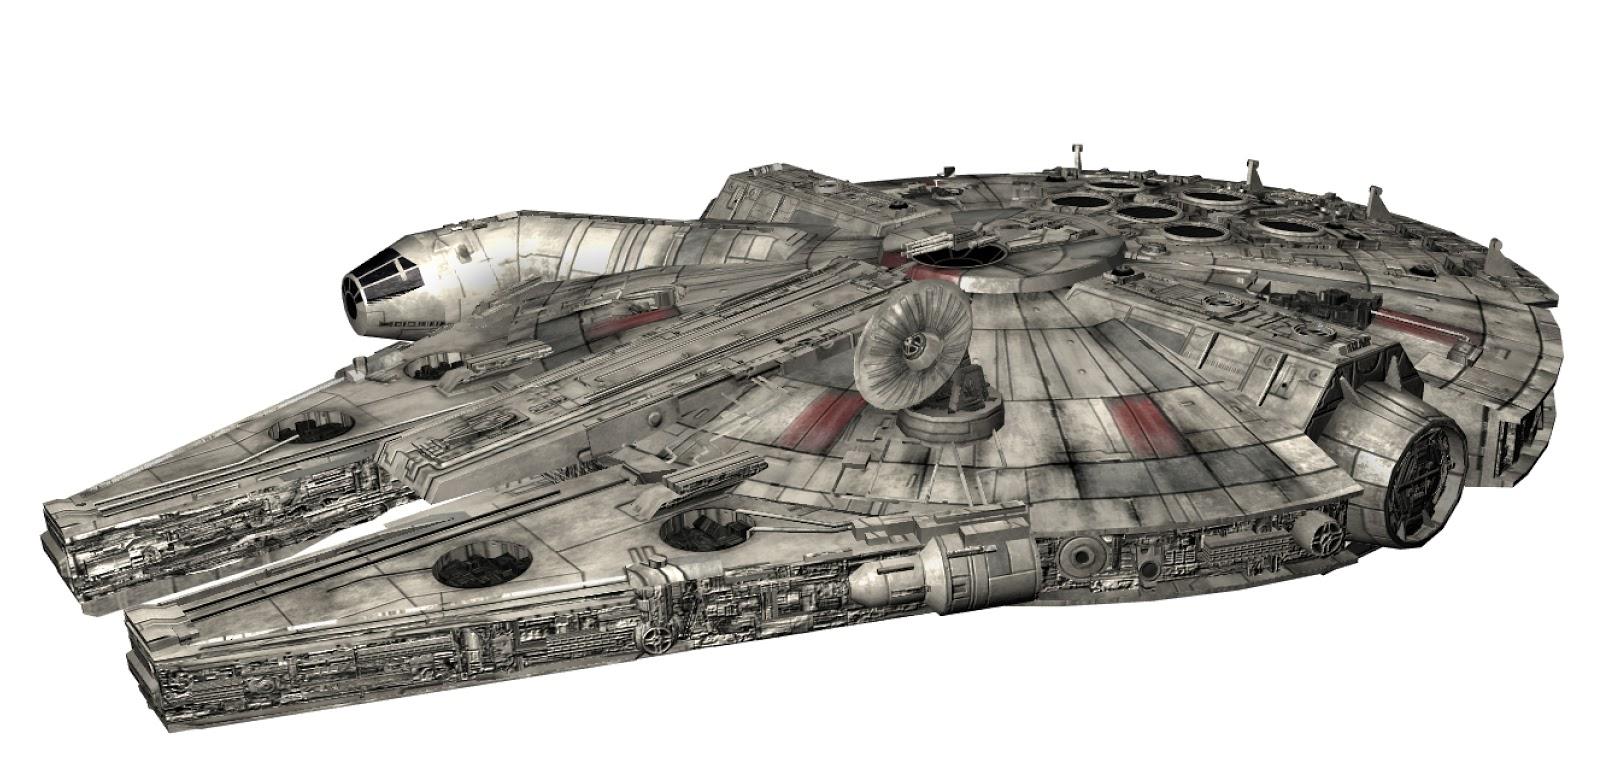 Game Ready Star Wars Millennium Falcon 3D model